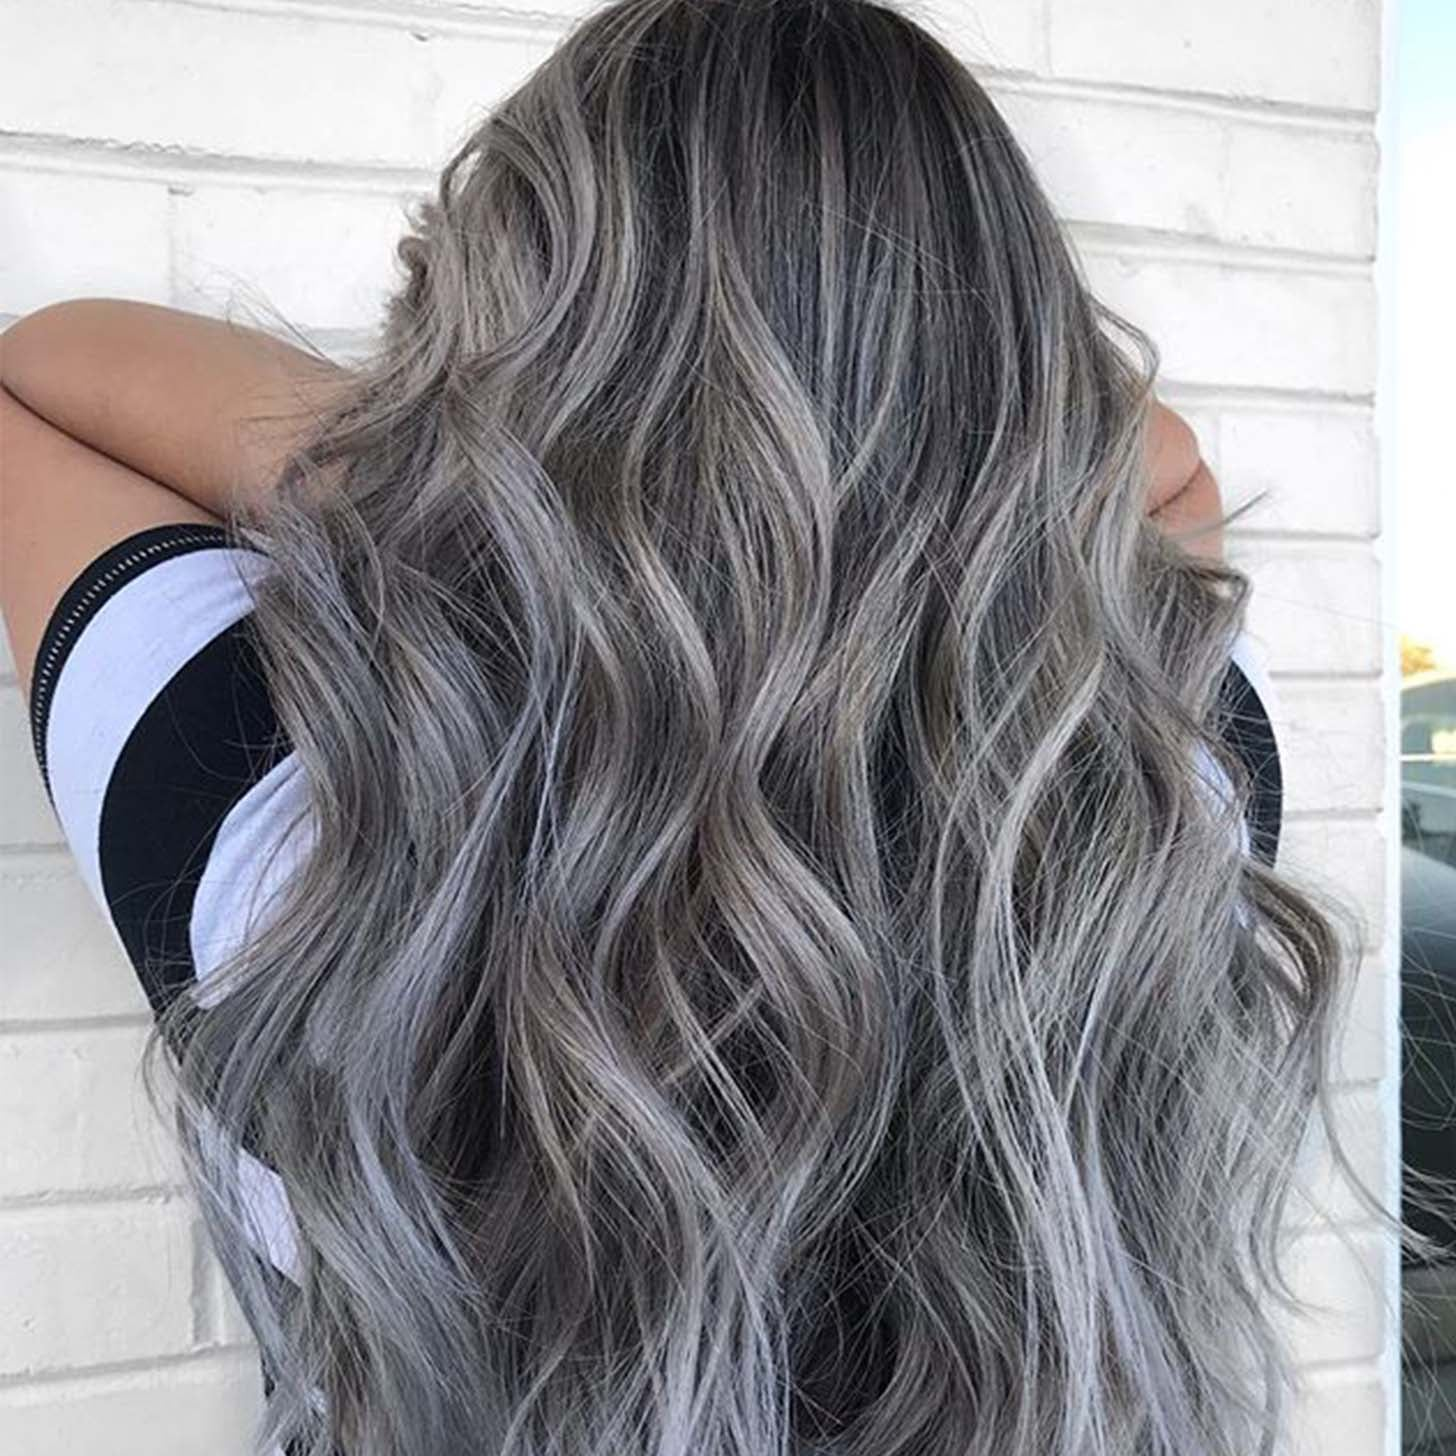 Silver Highlights Pinterest Trend Popsugar Beauty